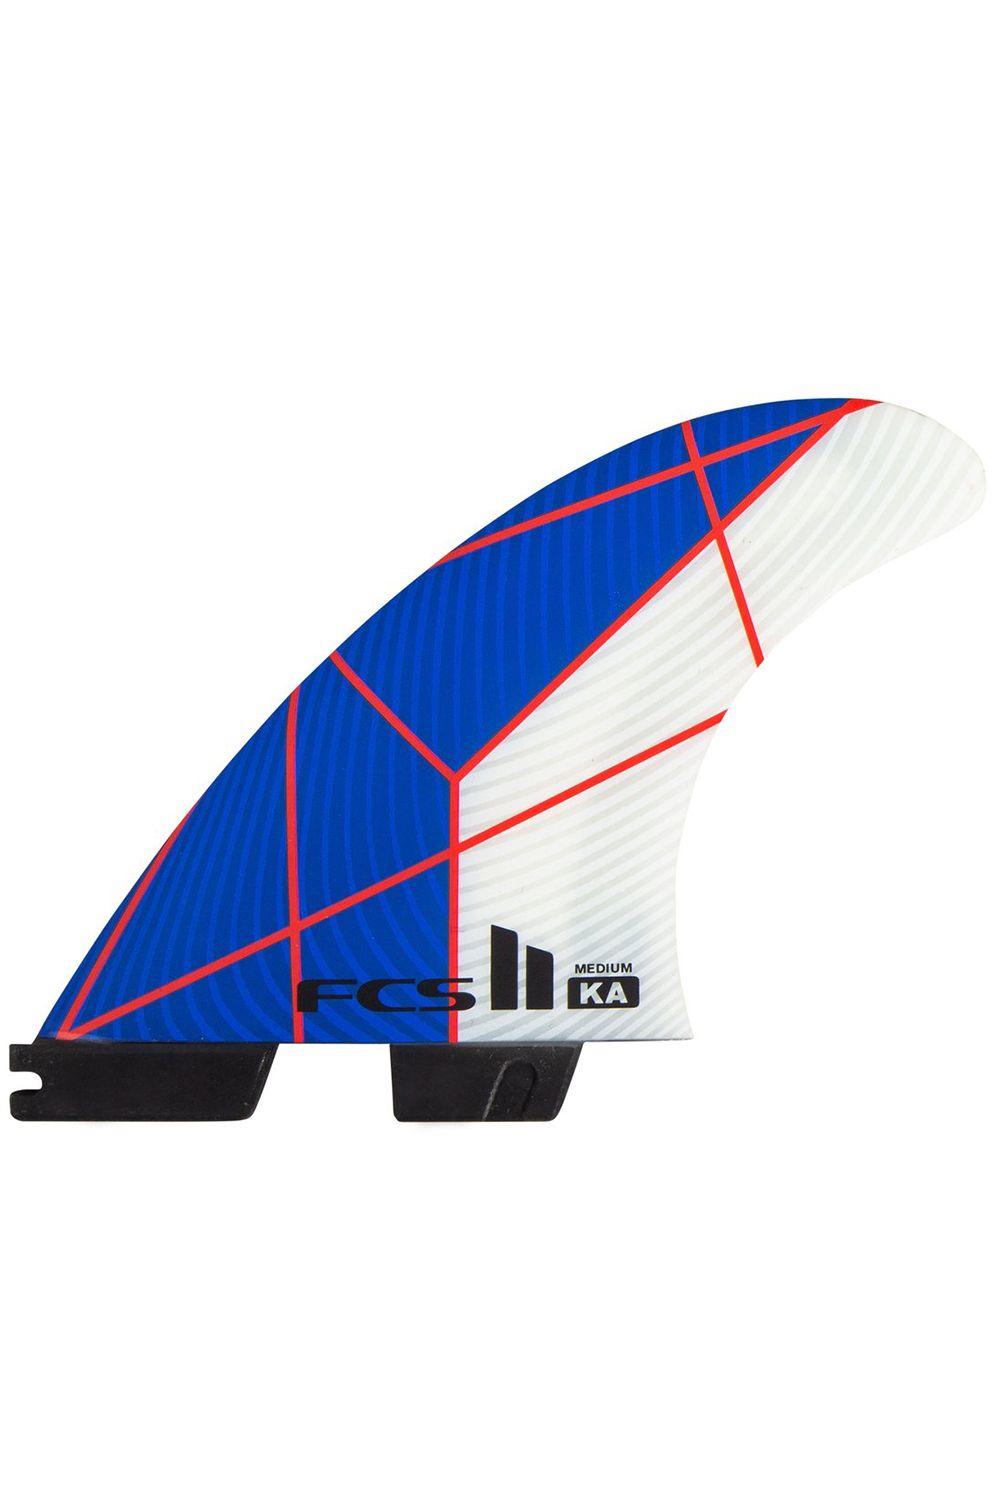 Quilha Fcs II KA PC MEDIUM BLUE/WHITE TRI Tri FCS II M